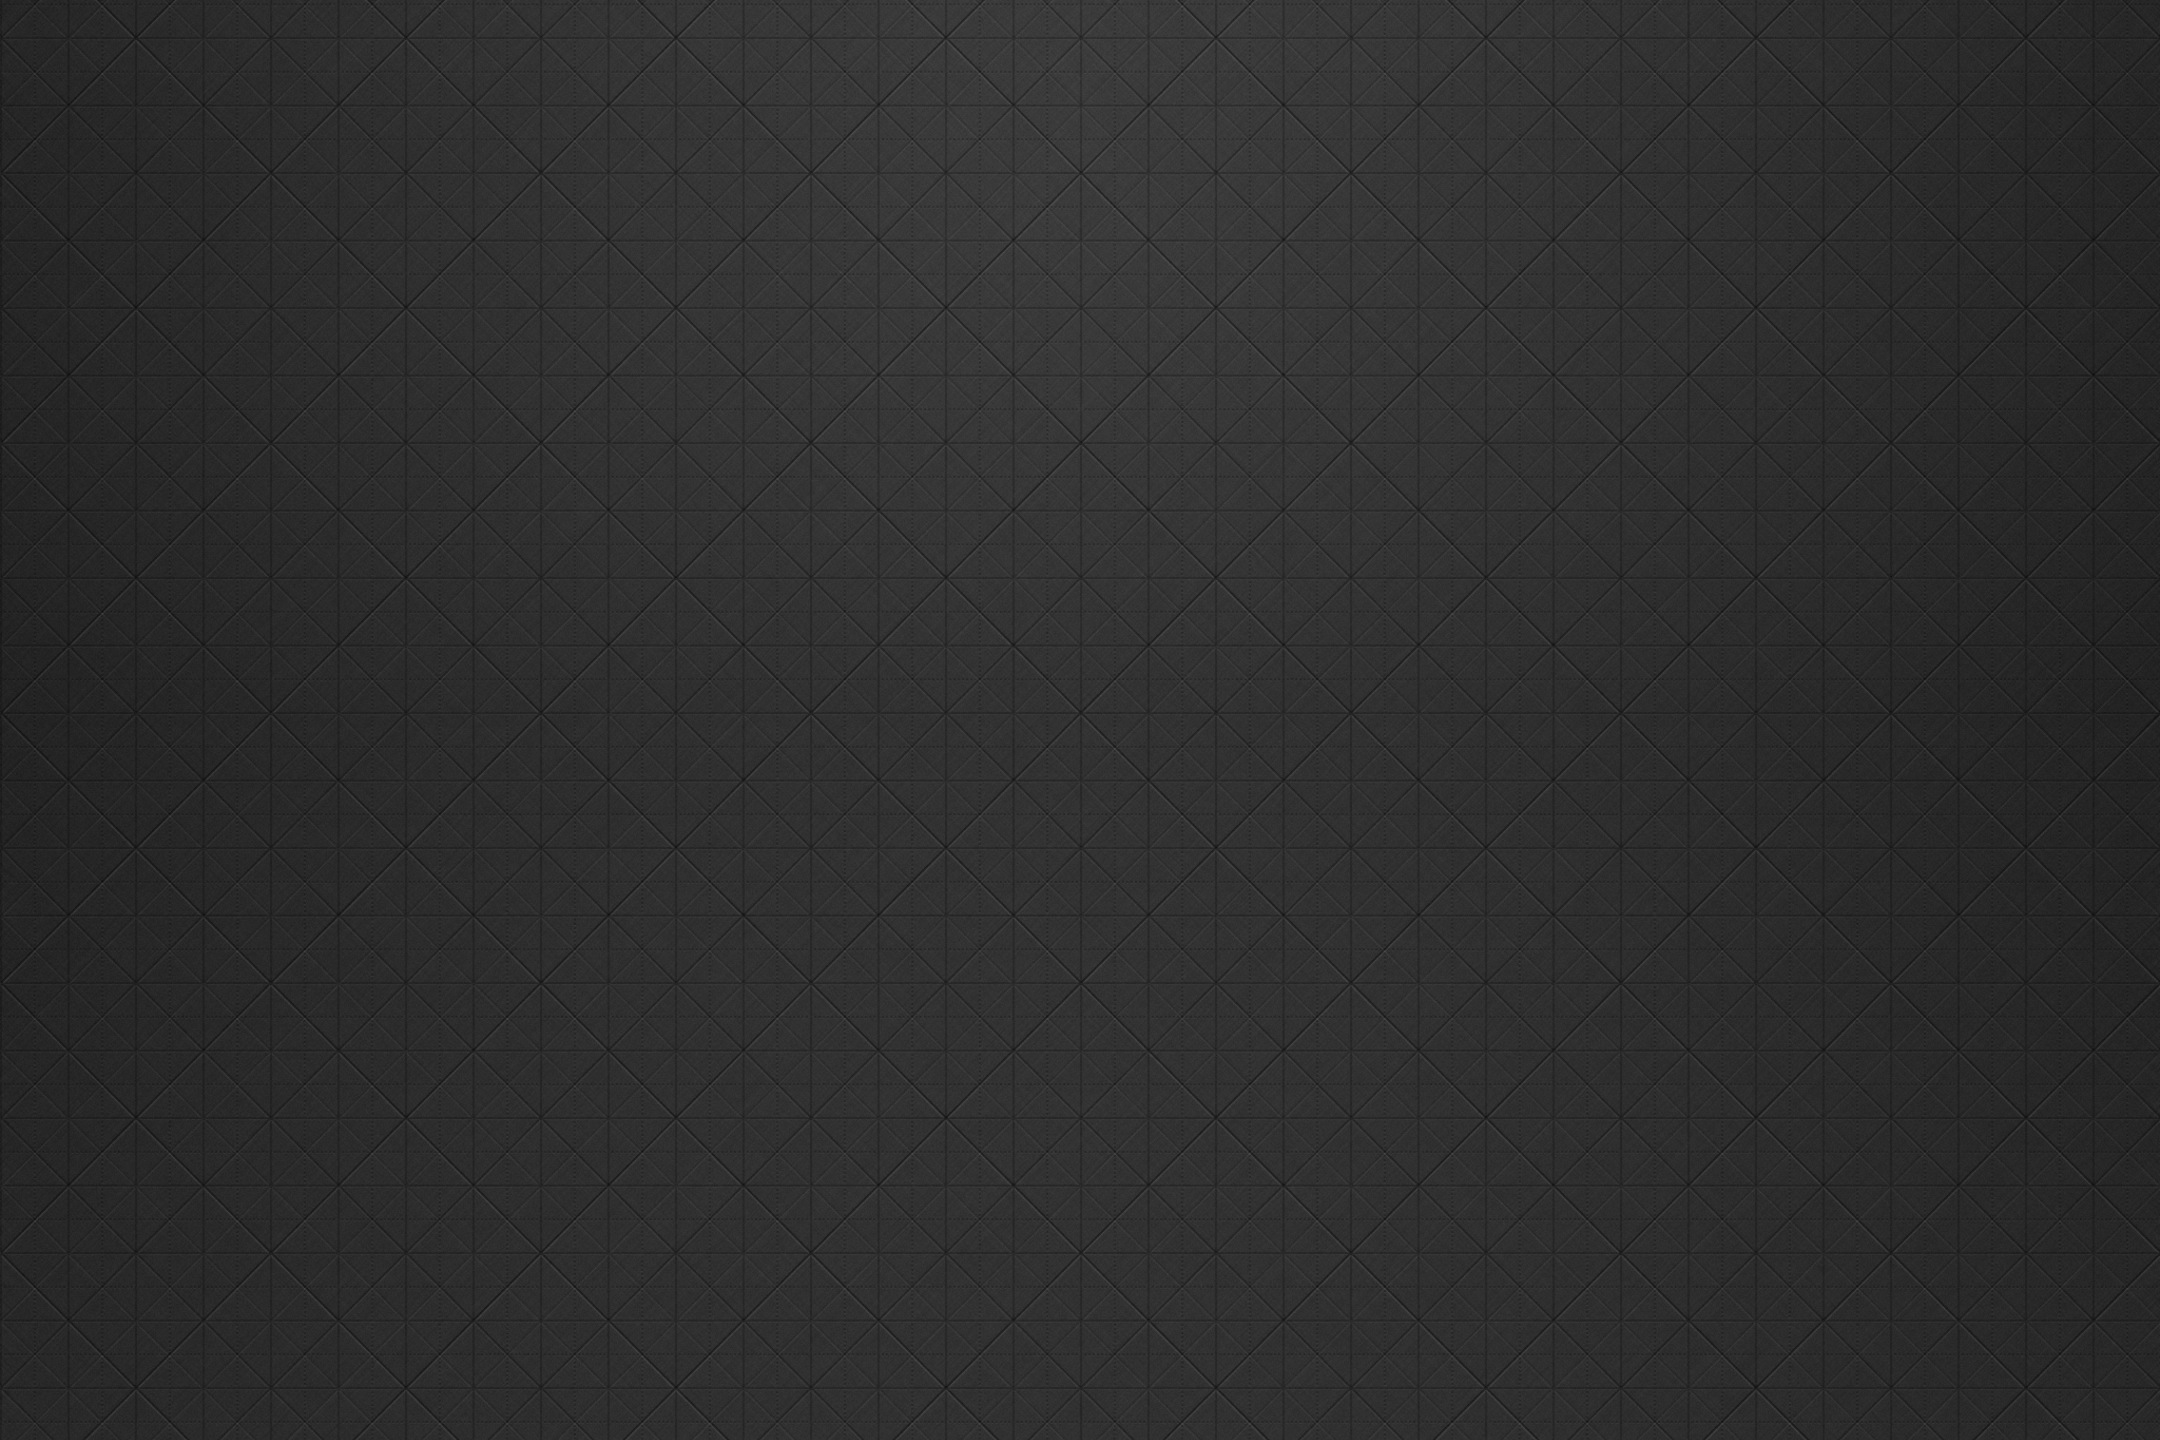 21601440 Wallpaper 01411 PCnet 2160x1440